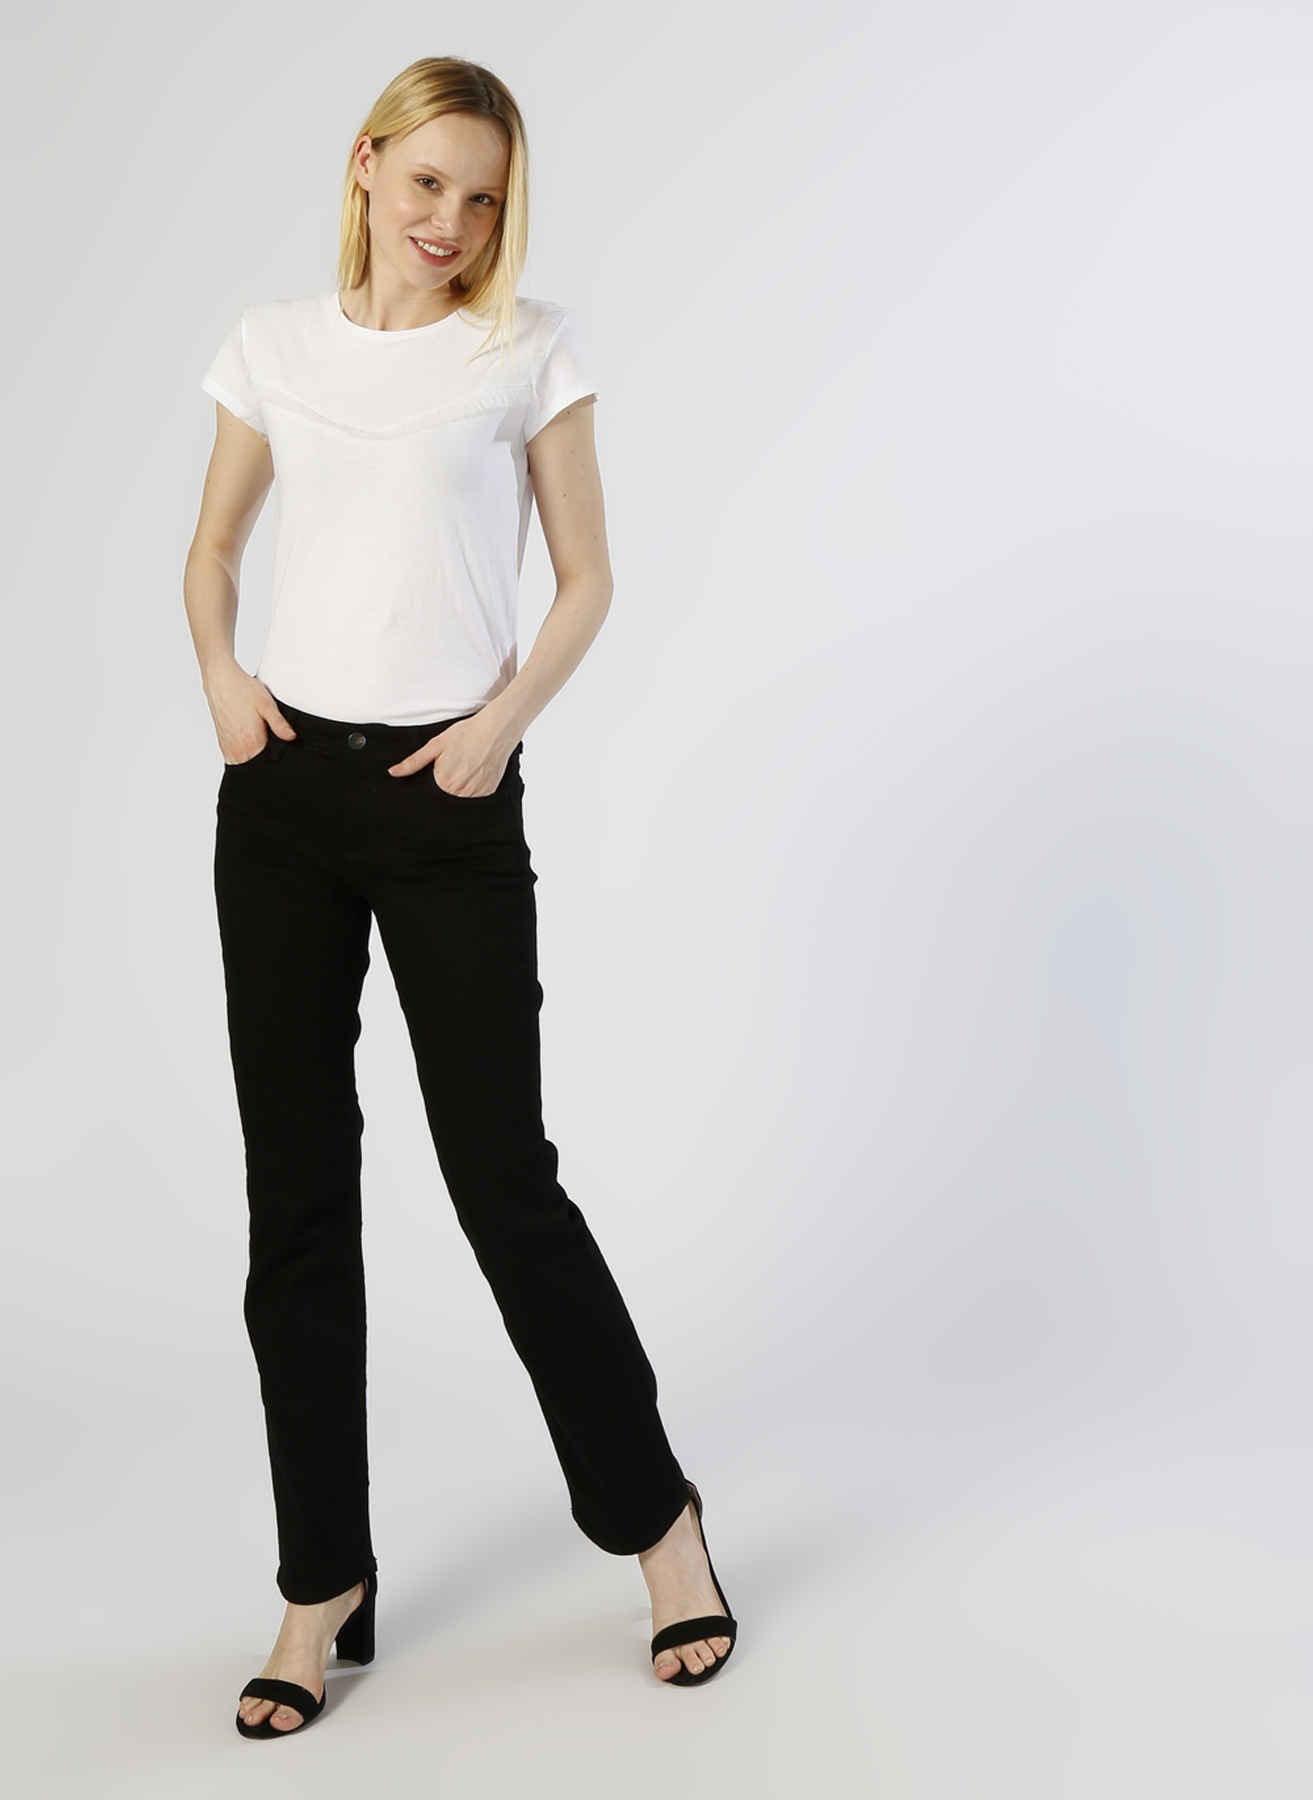 Loft Slim Fit Siyah Denim Pantolon 28-30 5000224877006 Ürün Resmi